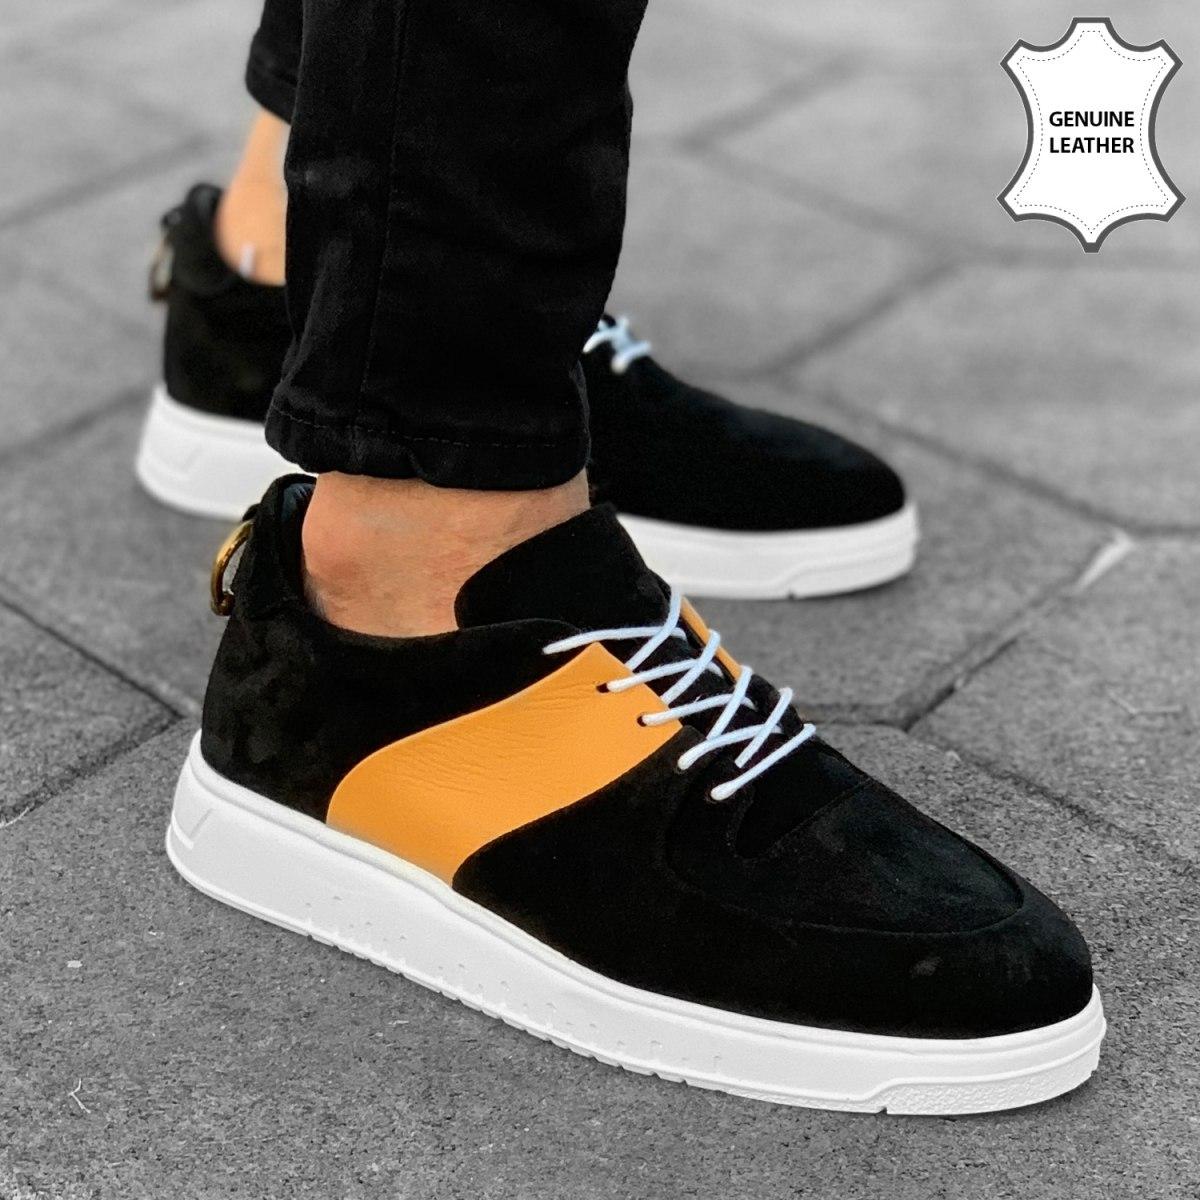 Herren Sneakers Aus Premium Leder Mit Ring Detail Mv Premium Brand - 1